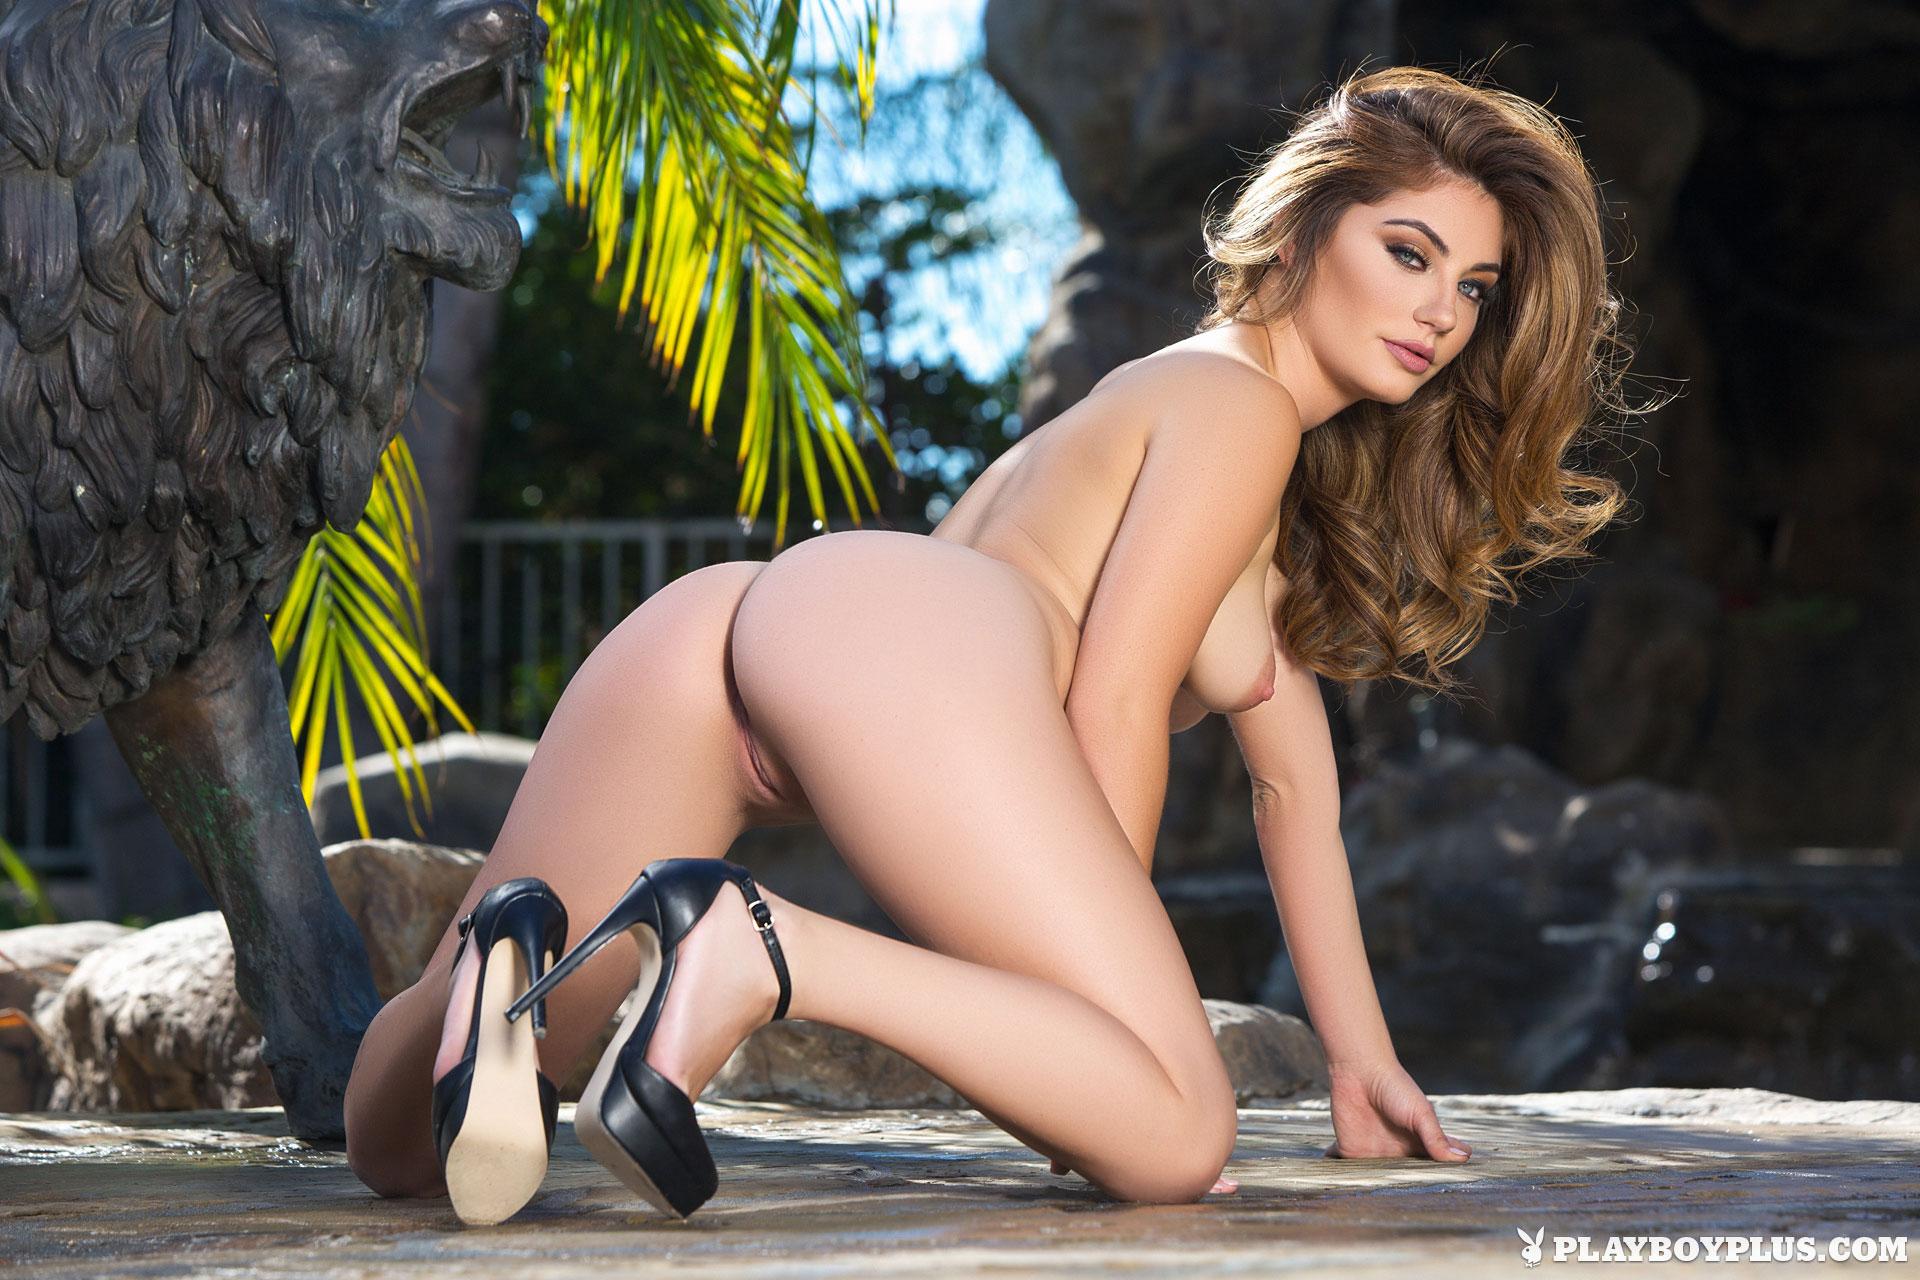 Lauren gottlieb xxx photo, kerala village naked girl photos